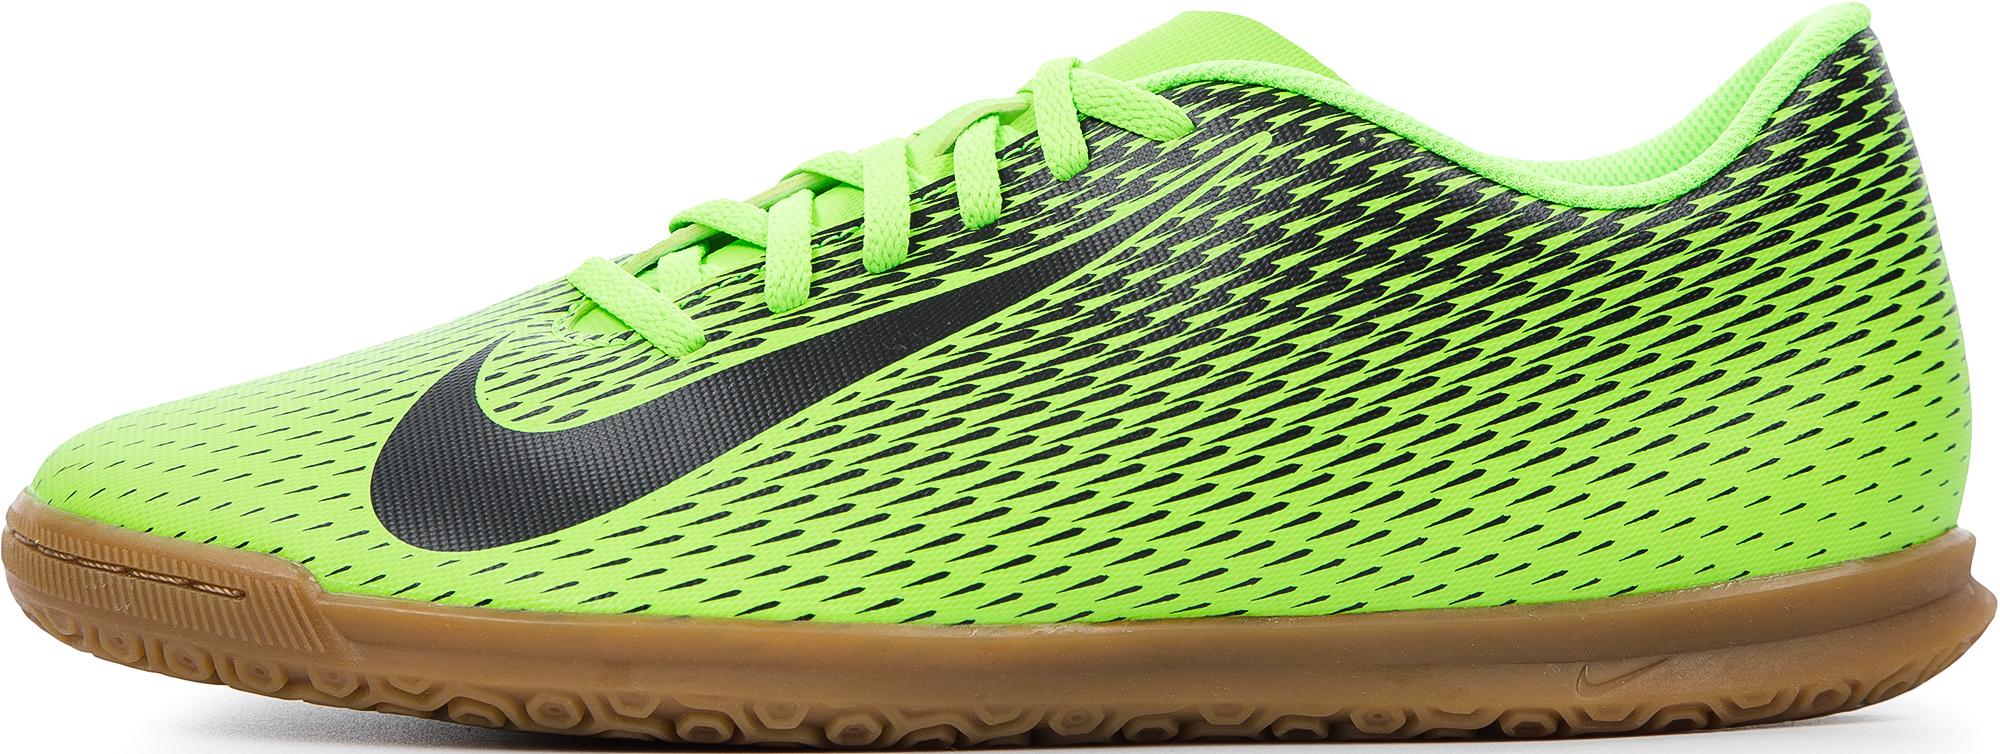 Nike Бутсы мужские Nike Bravata Ii Ic, размер 46,5 nike mercurialx proximo ii ic